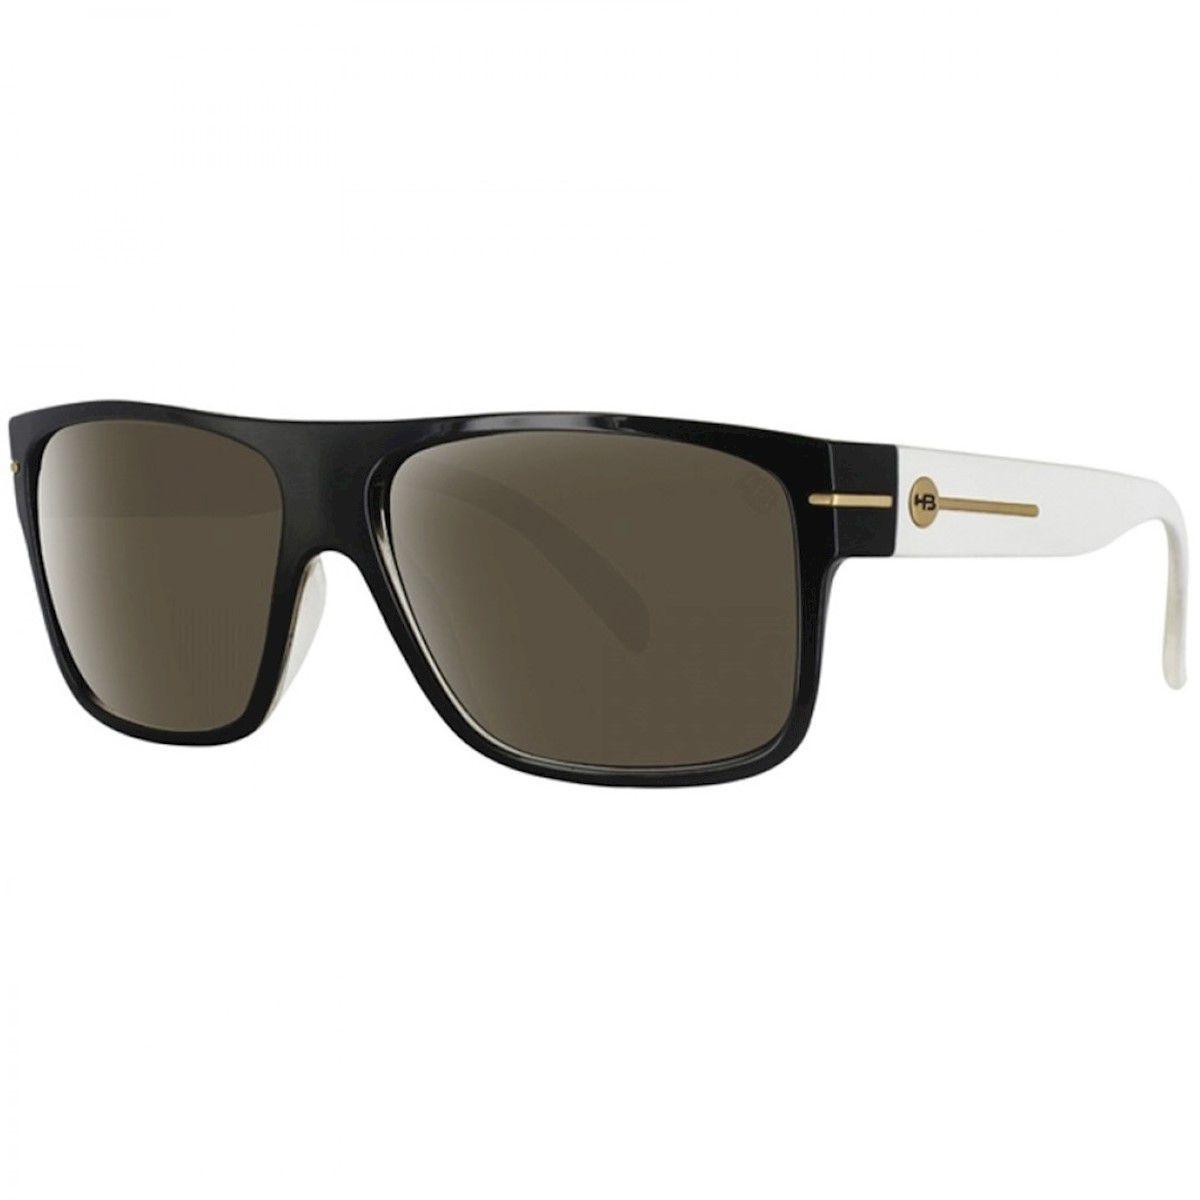 Óculos de Sol HB Would Black White/Brown